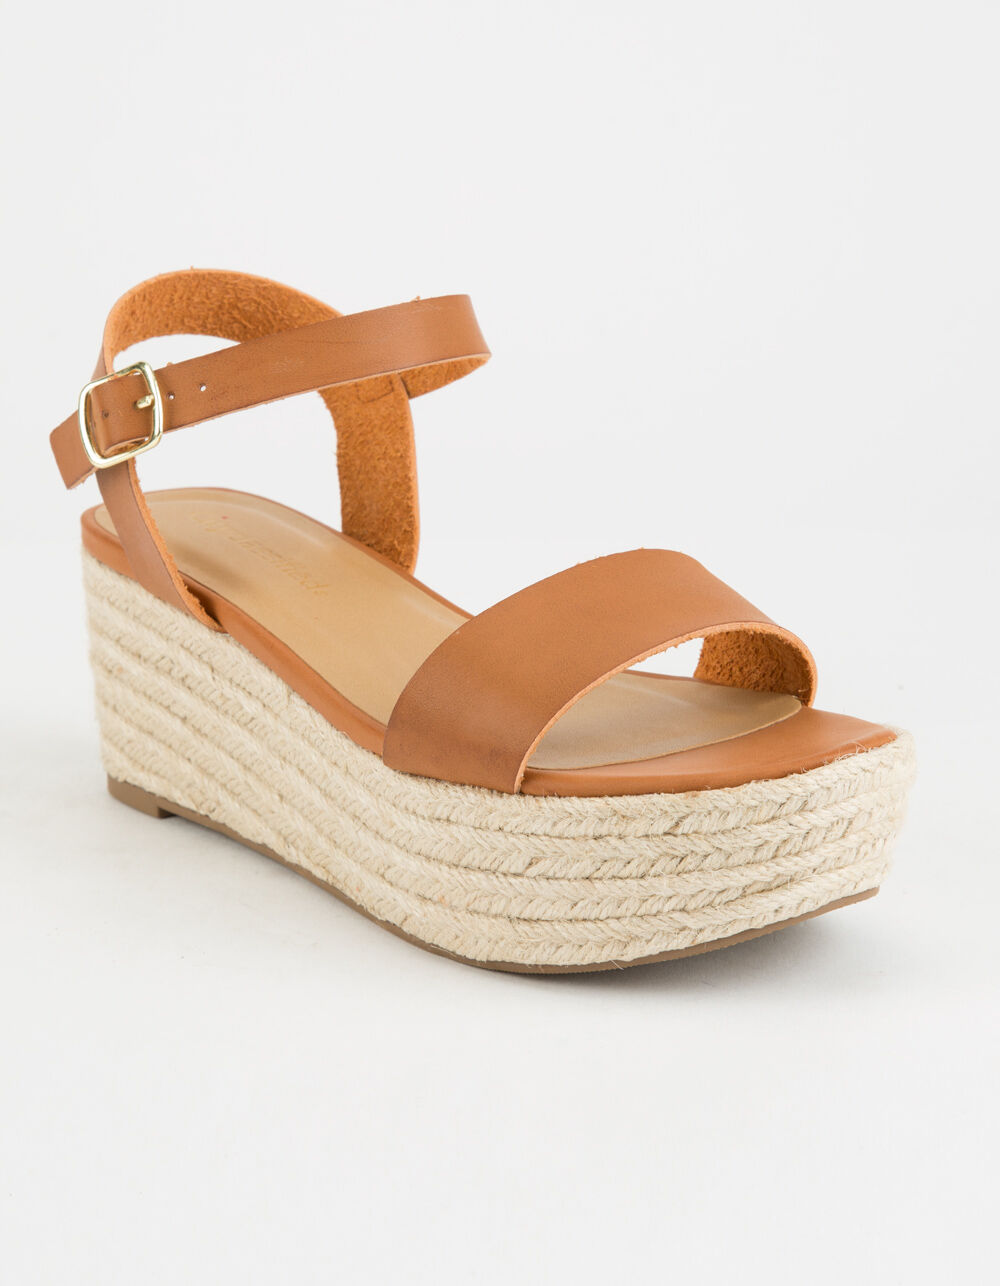 CITY CLASSIFIED Espadrille Tan Platform Sandals